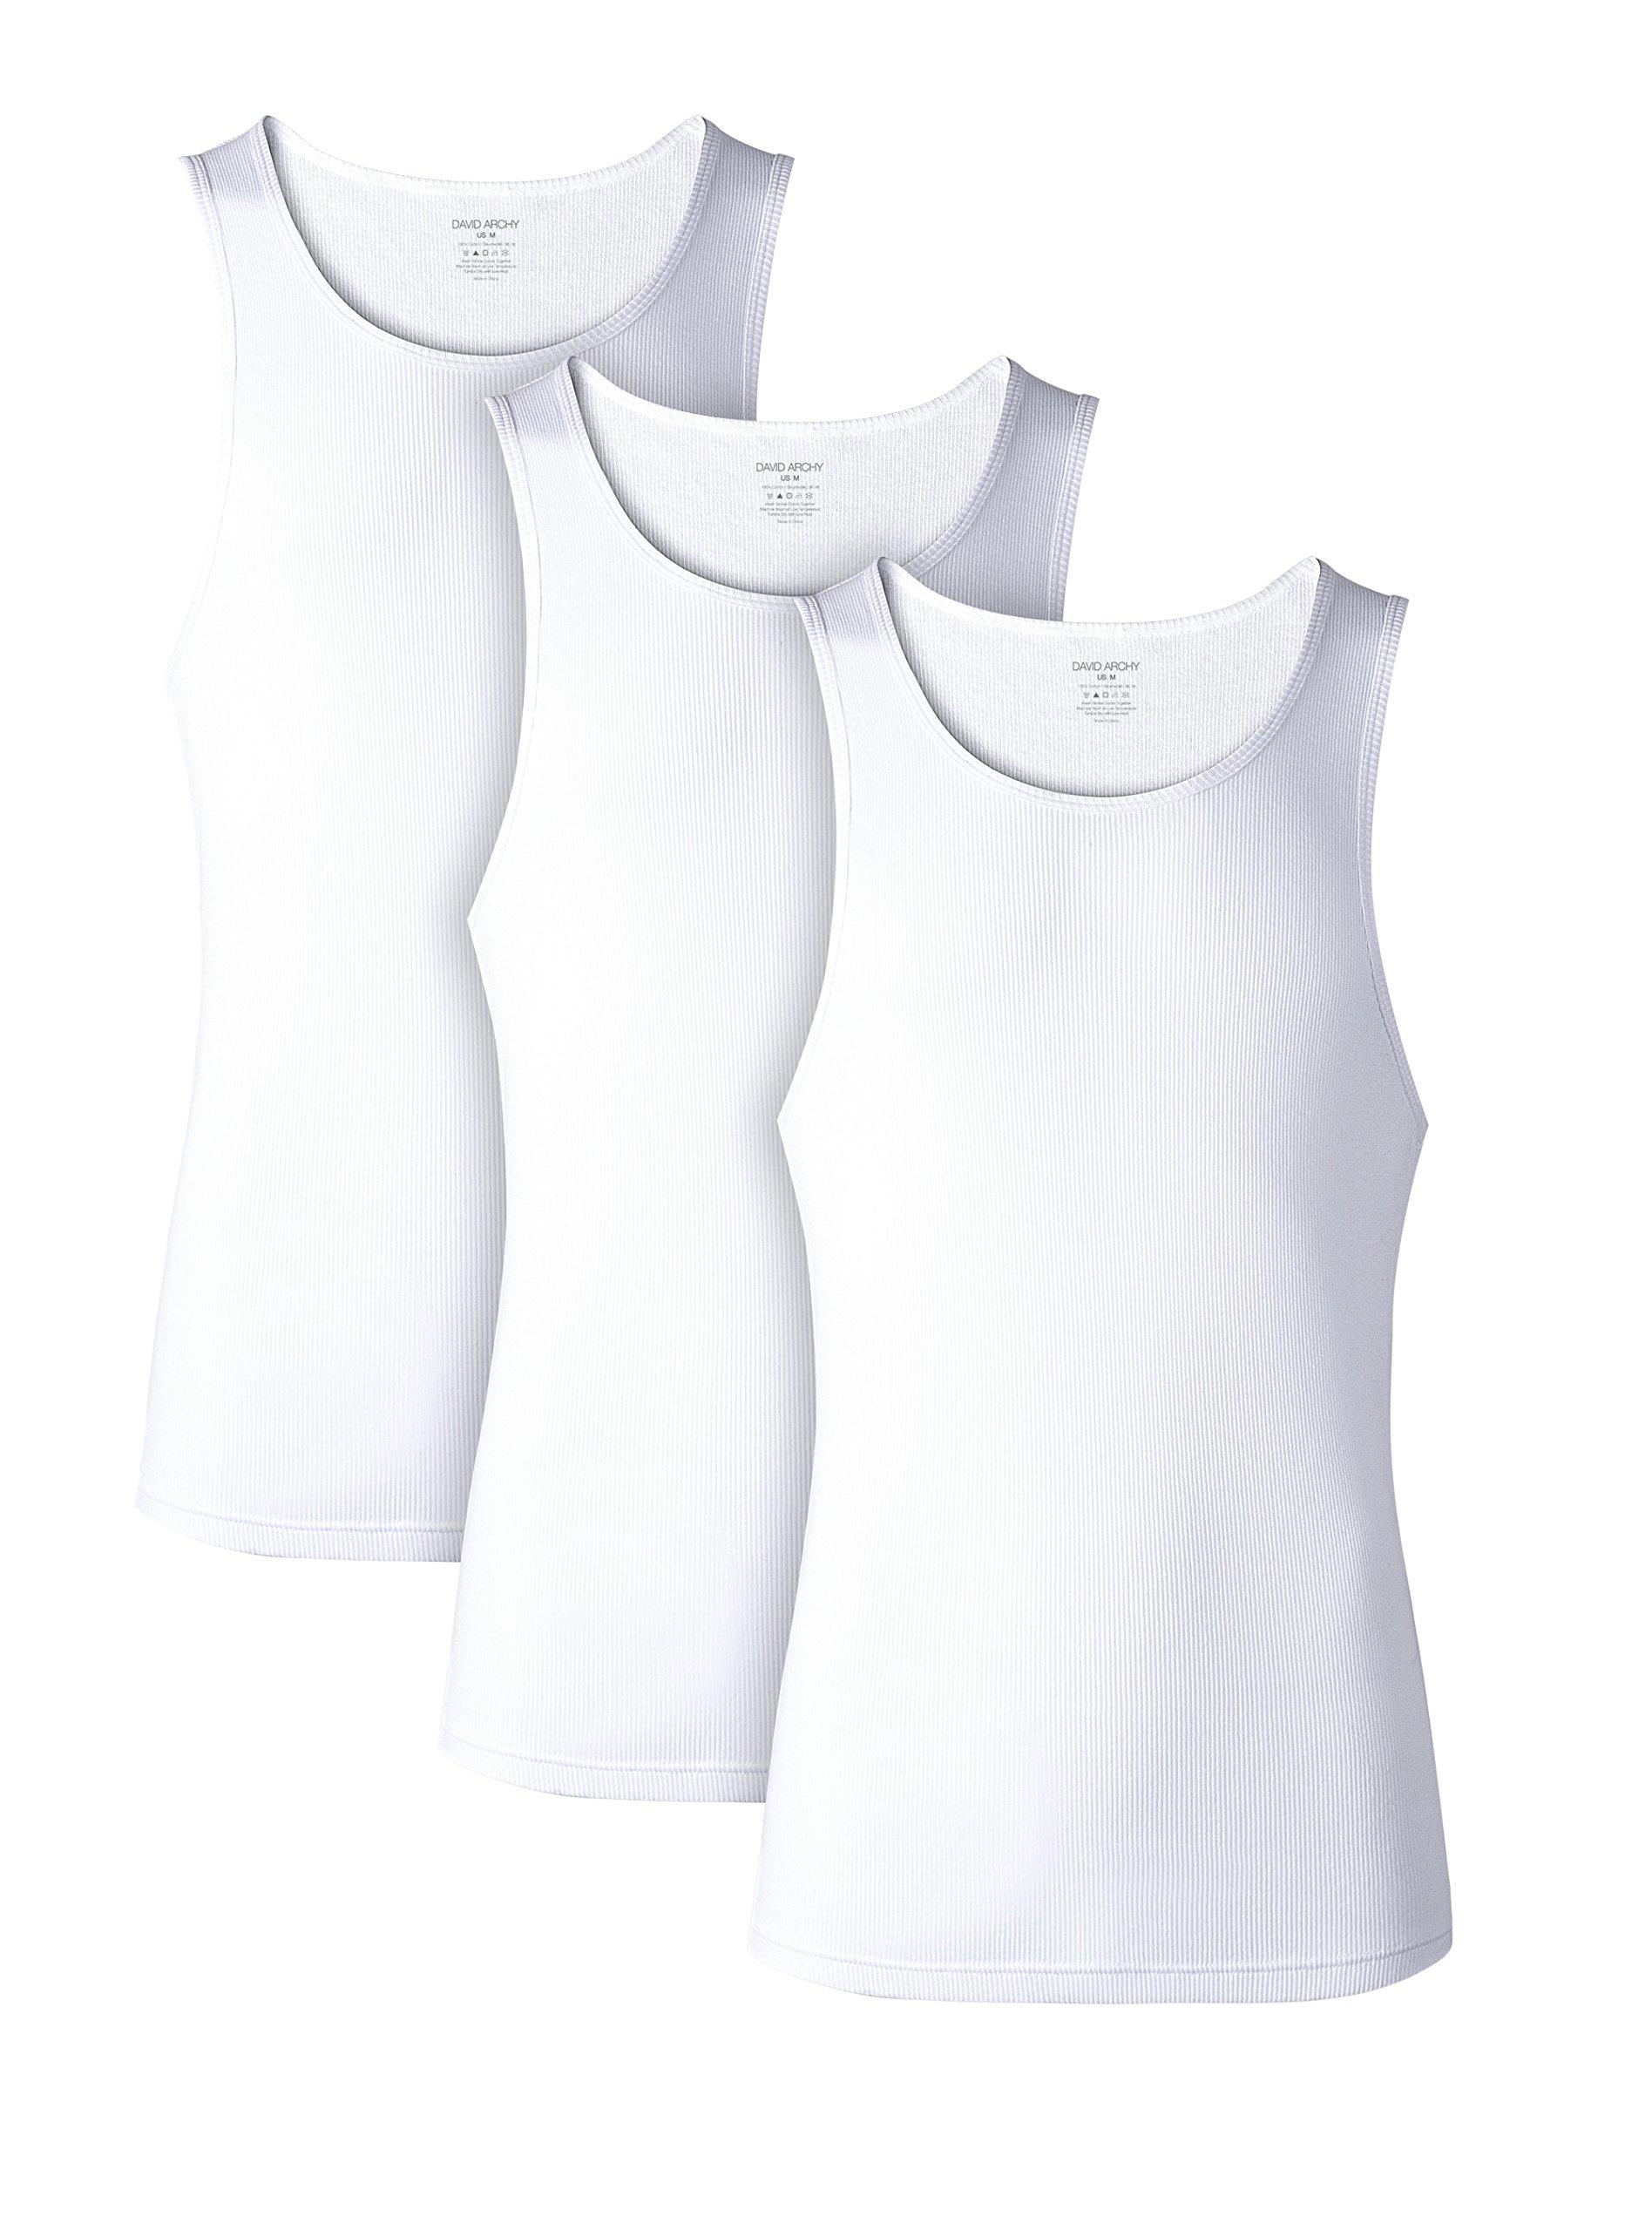 David Archy Men's 3 Pack Cotton Rib Tank Top